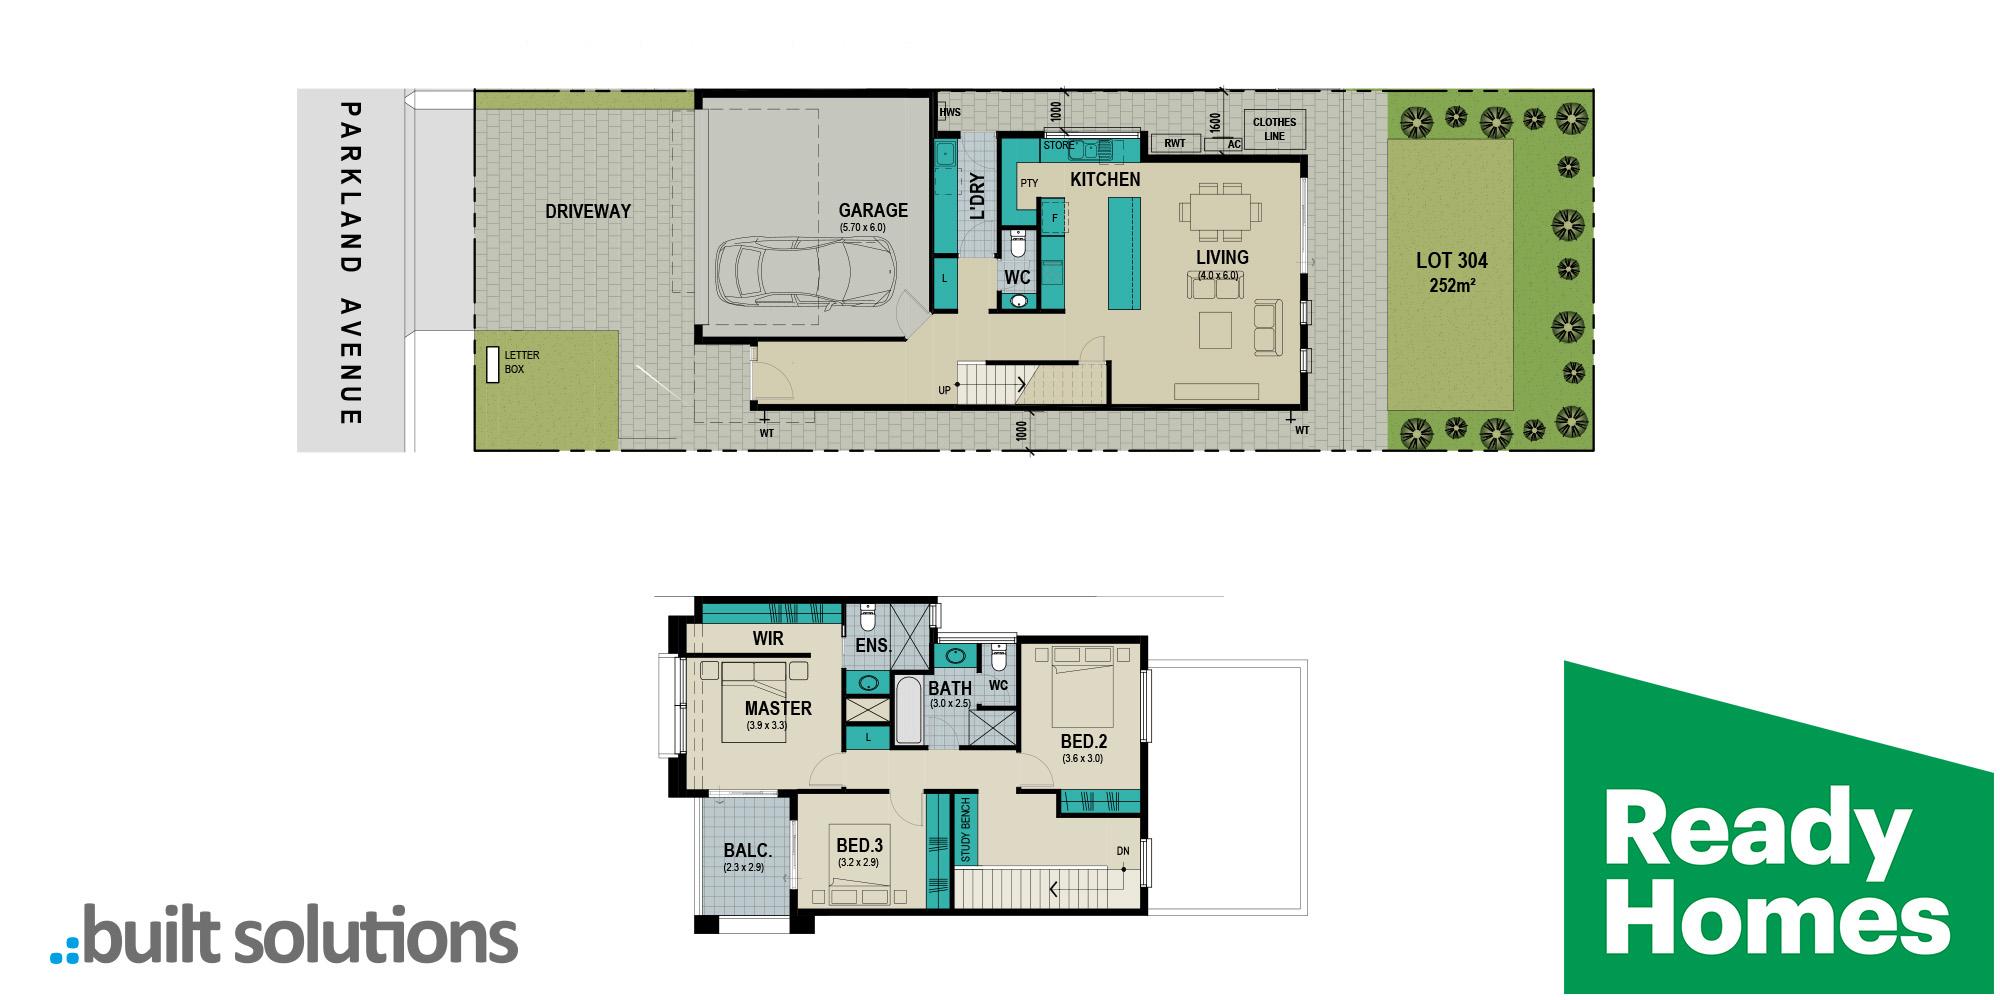 Lot 304 Parkland Avenue floorplan